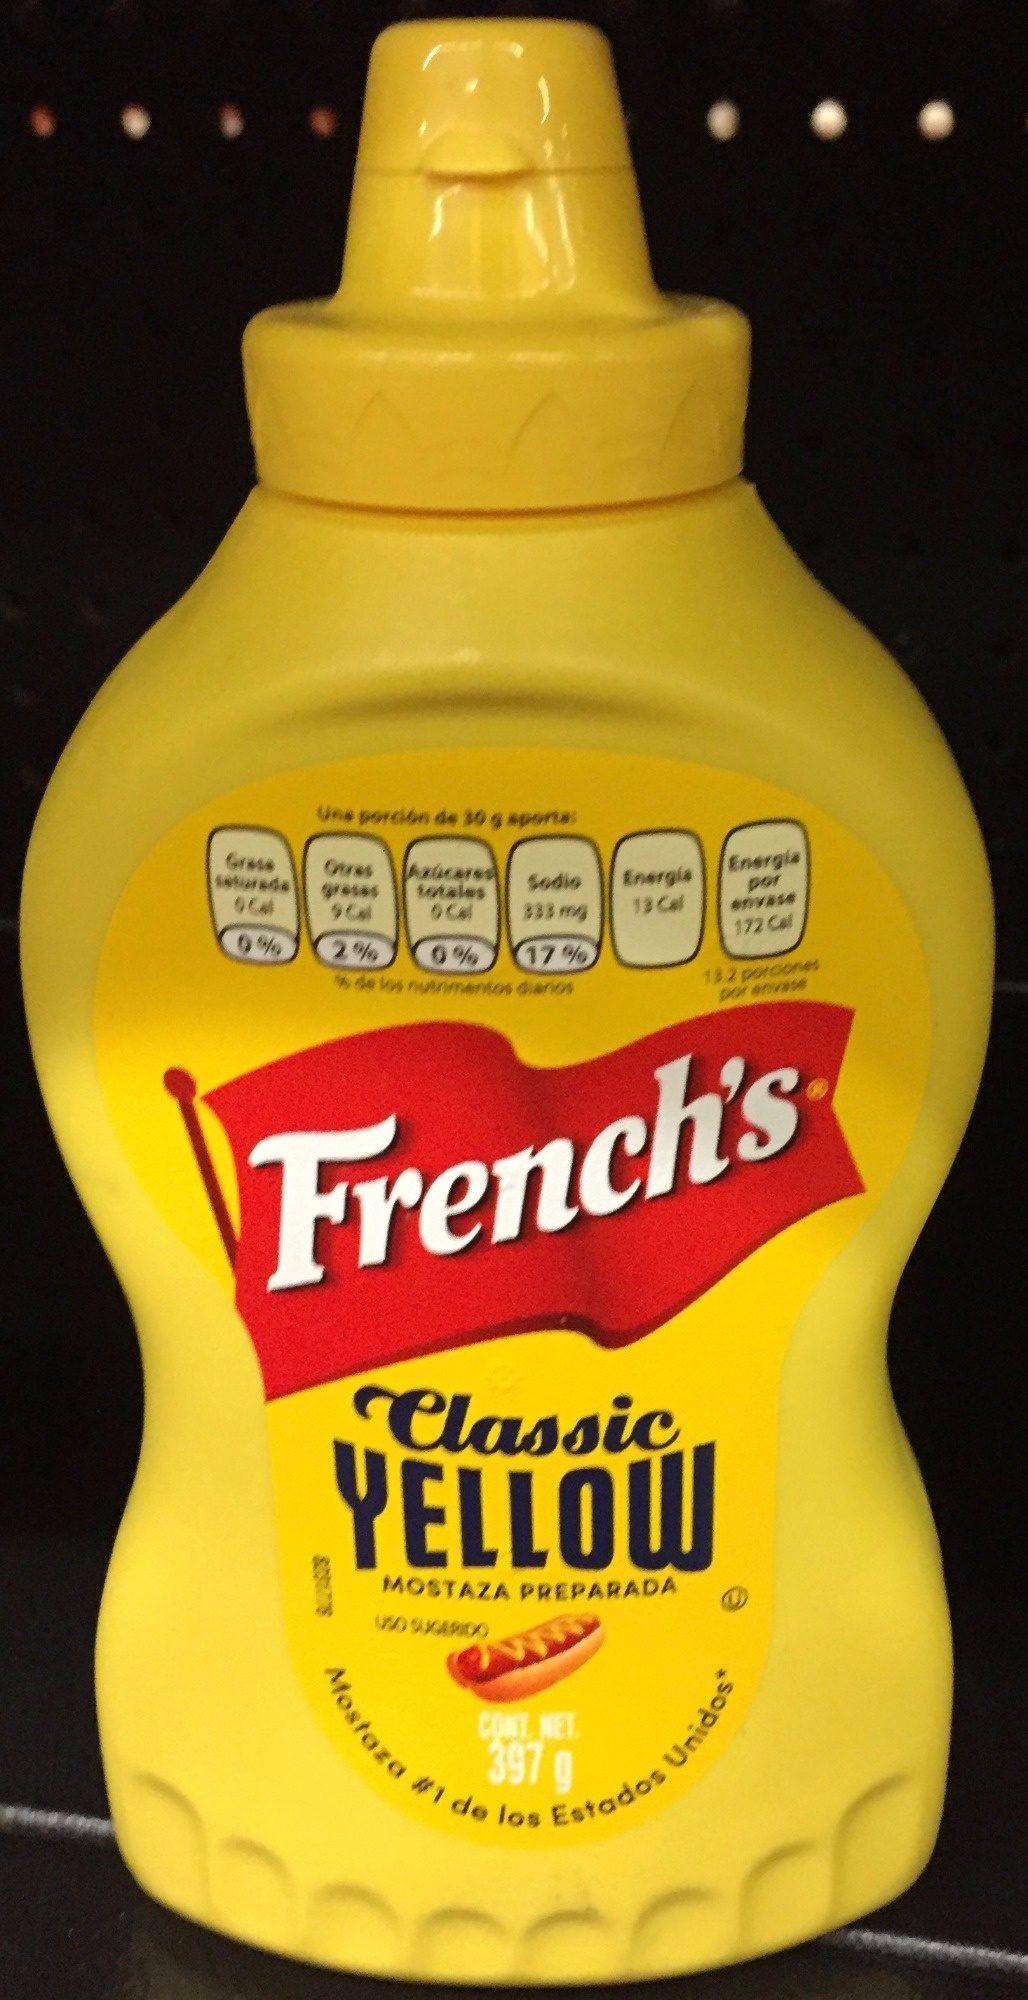 Mostaza Classic Yellow Botella Plástica 396 GR - Producto - es